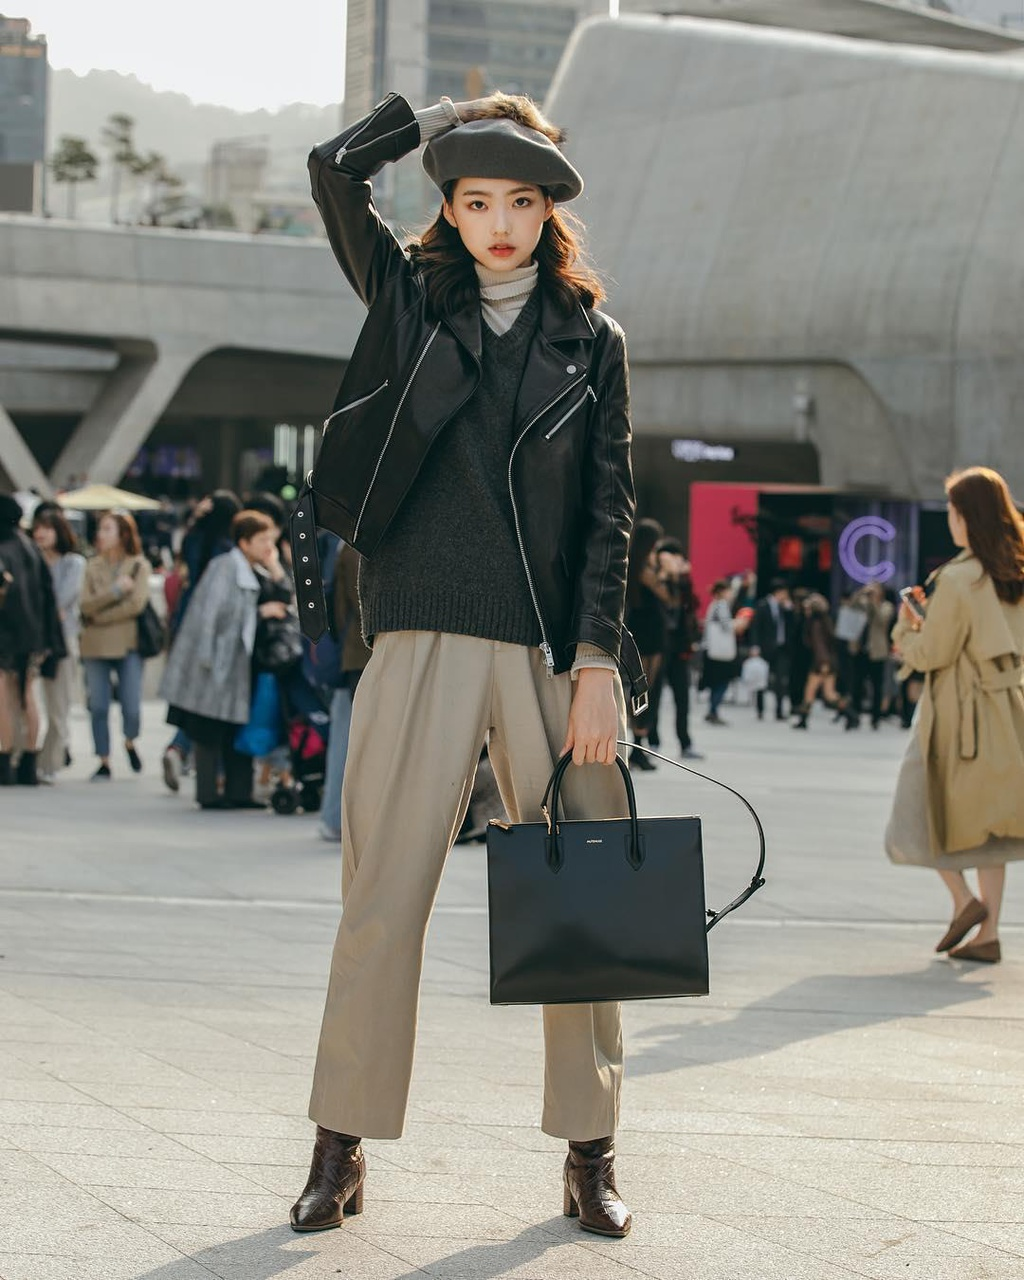 Hinh anh A quan The Face tai Seoul Fashion Week len Vogue hinh anh 13